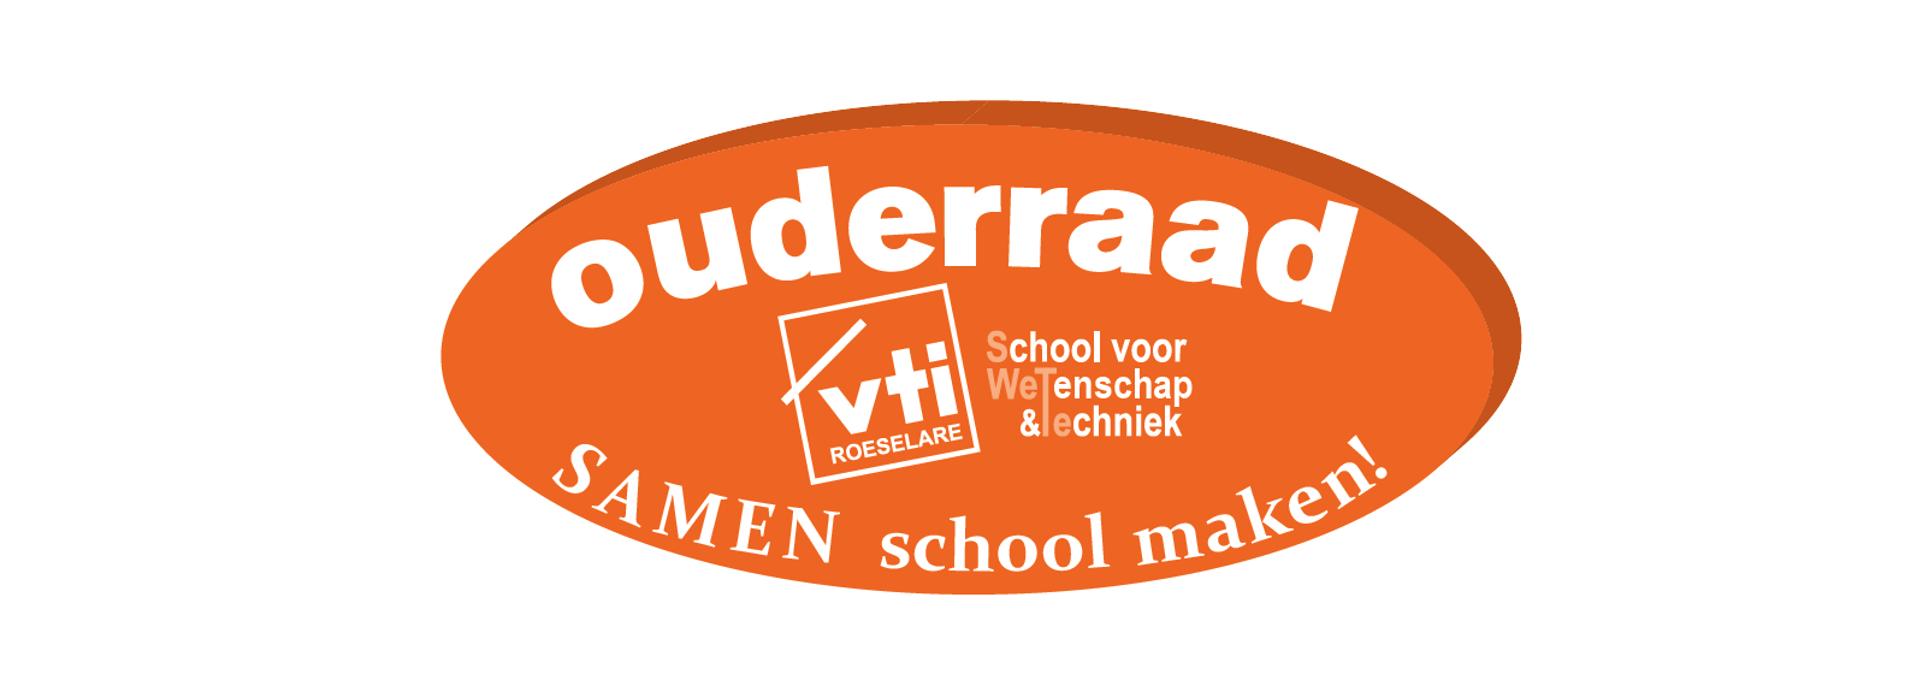 VTI Roeselare ouderraad logo